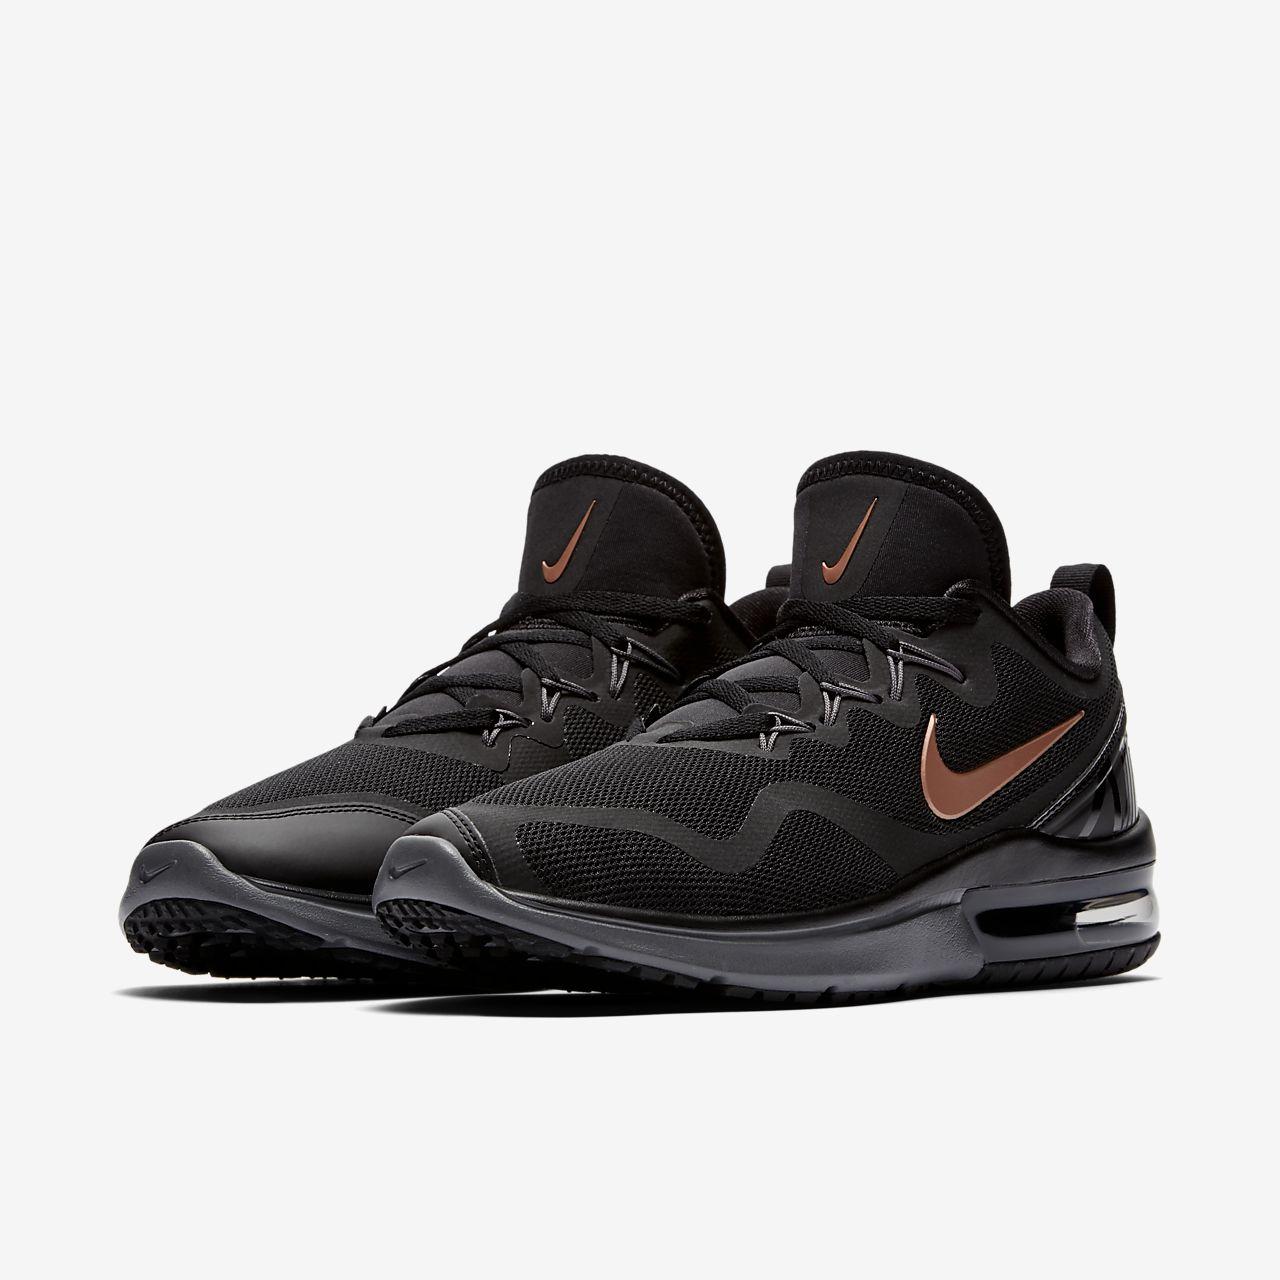 Nike Air Max Fury WMNS / -Anthracite IbtJu